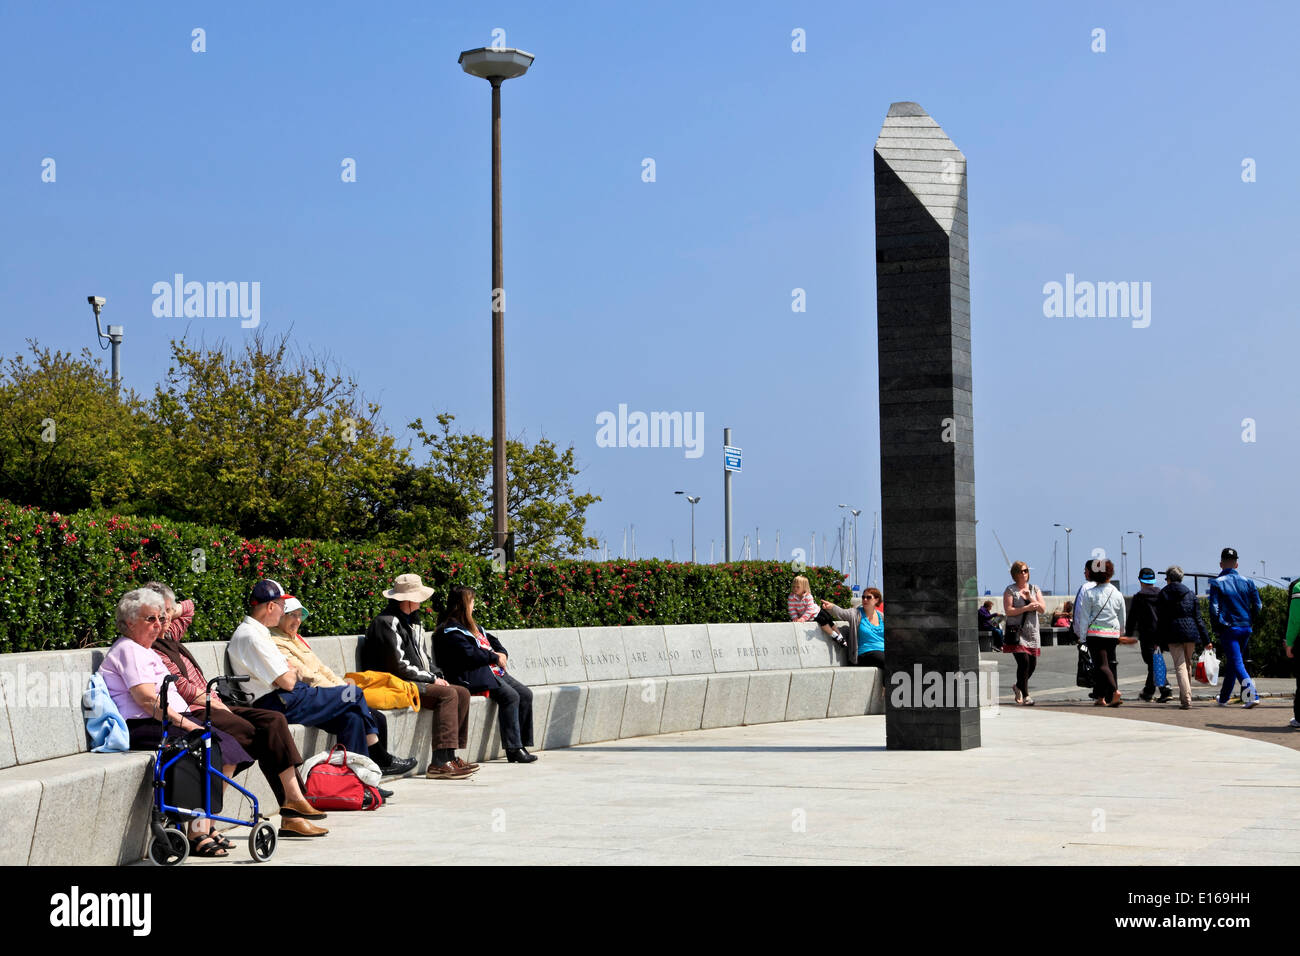 9200. St Peter Port, WW2 War Memorial, Guernsey, Channel Islands, UK, Europe - Stock Image